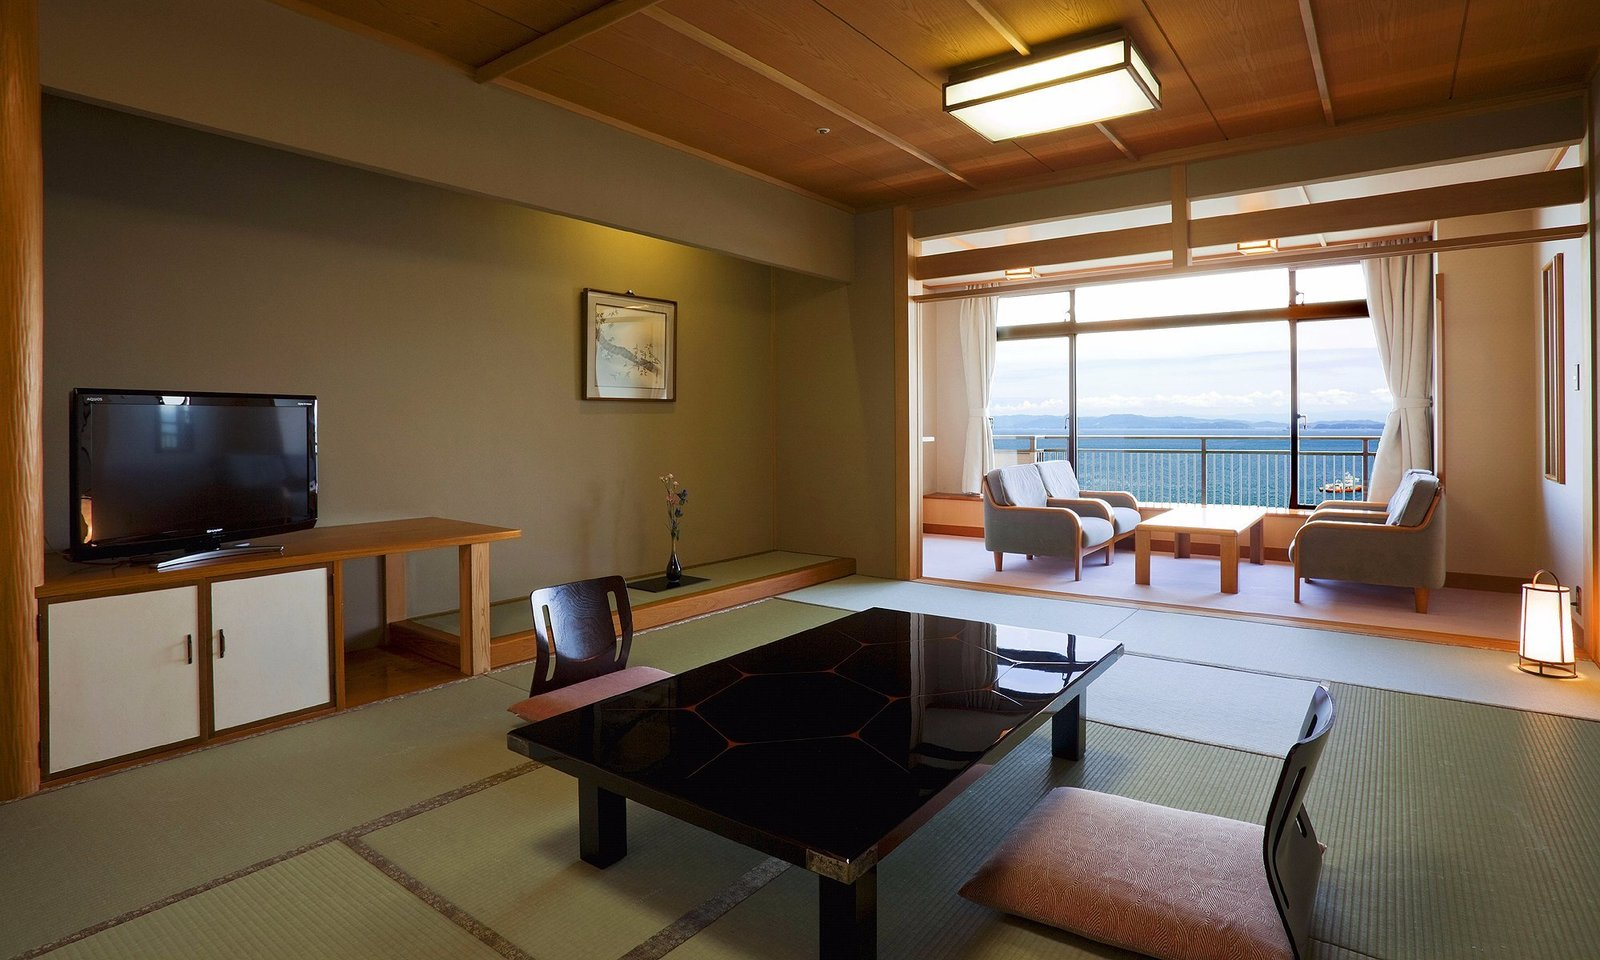 Living Room, Chair, Coffee Tables, Table, and Ceiling Lighting  Villa Rakuen